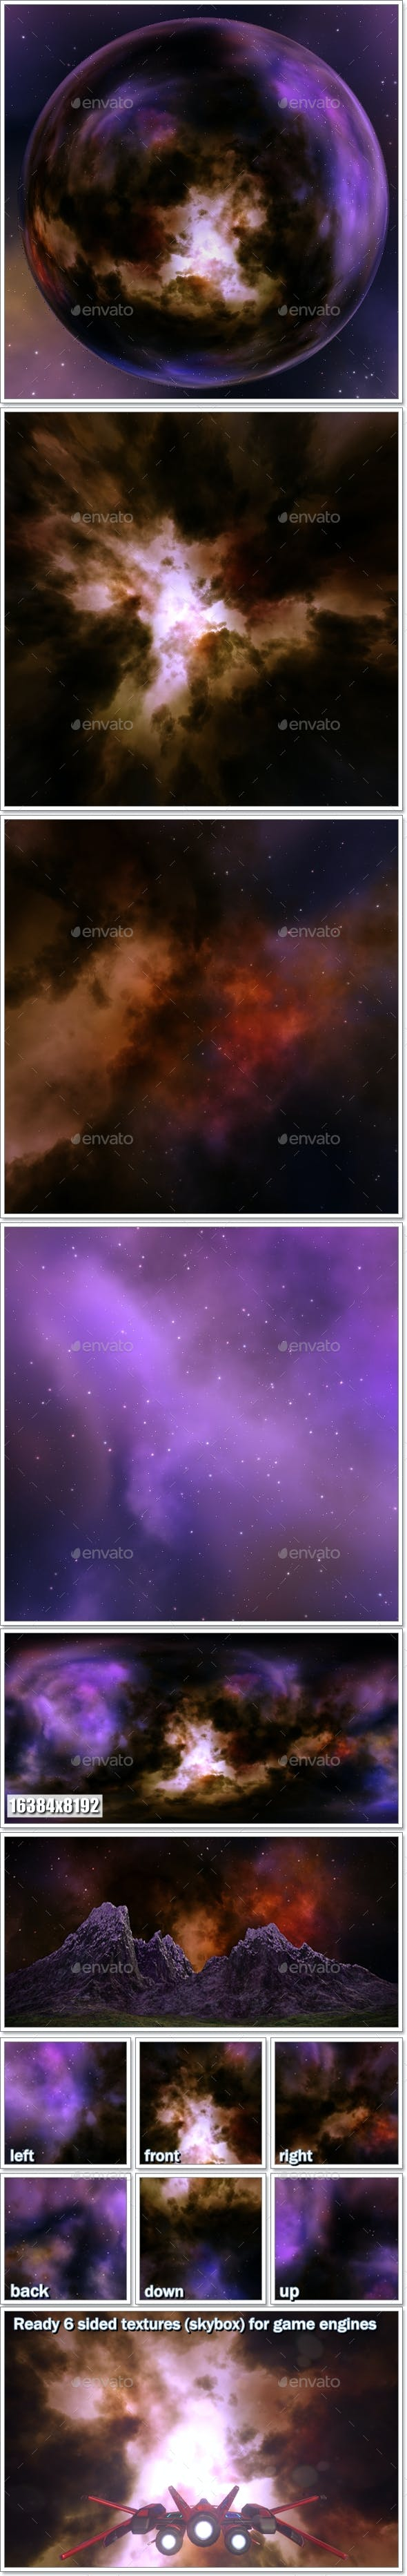 Nebula Space Environment HDRI Map 002 - 3DOcean Item for Sale